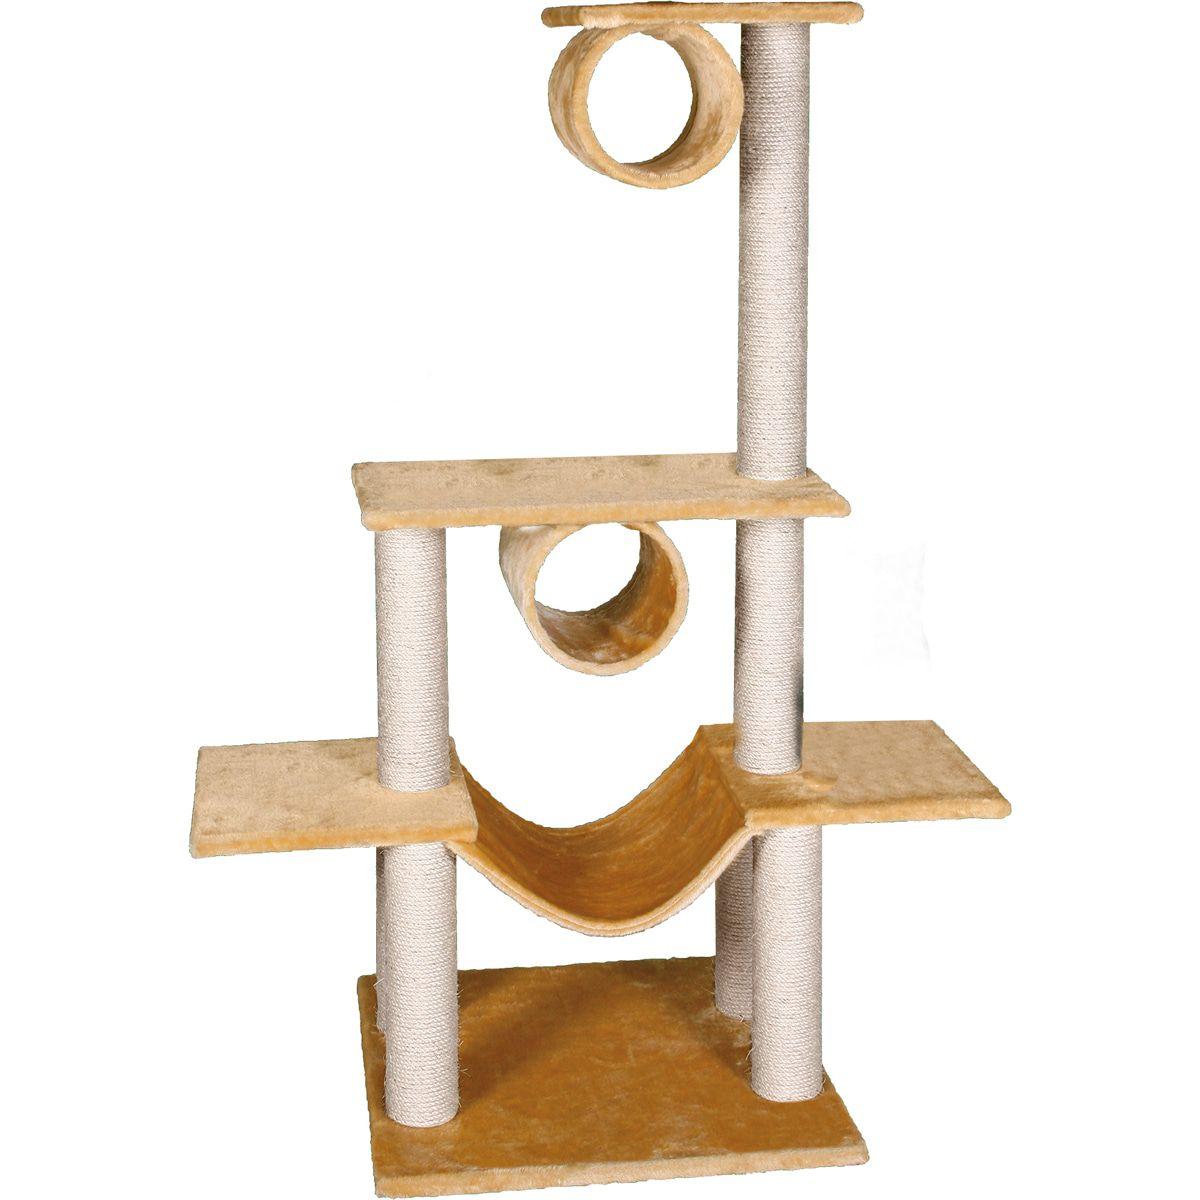 Krabpaal-Amedeo-Beige-103-x-57-x-141-cm-Flamingo-Beige